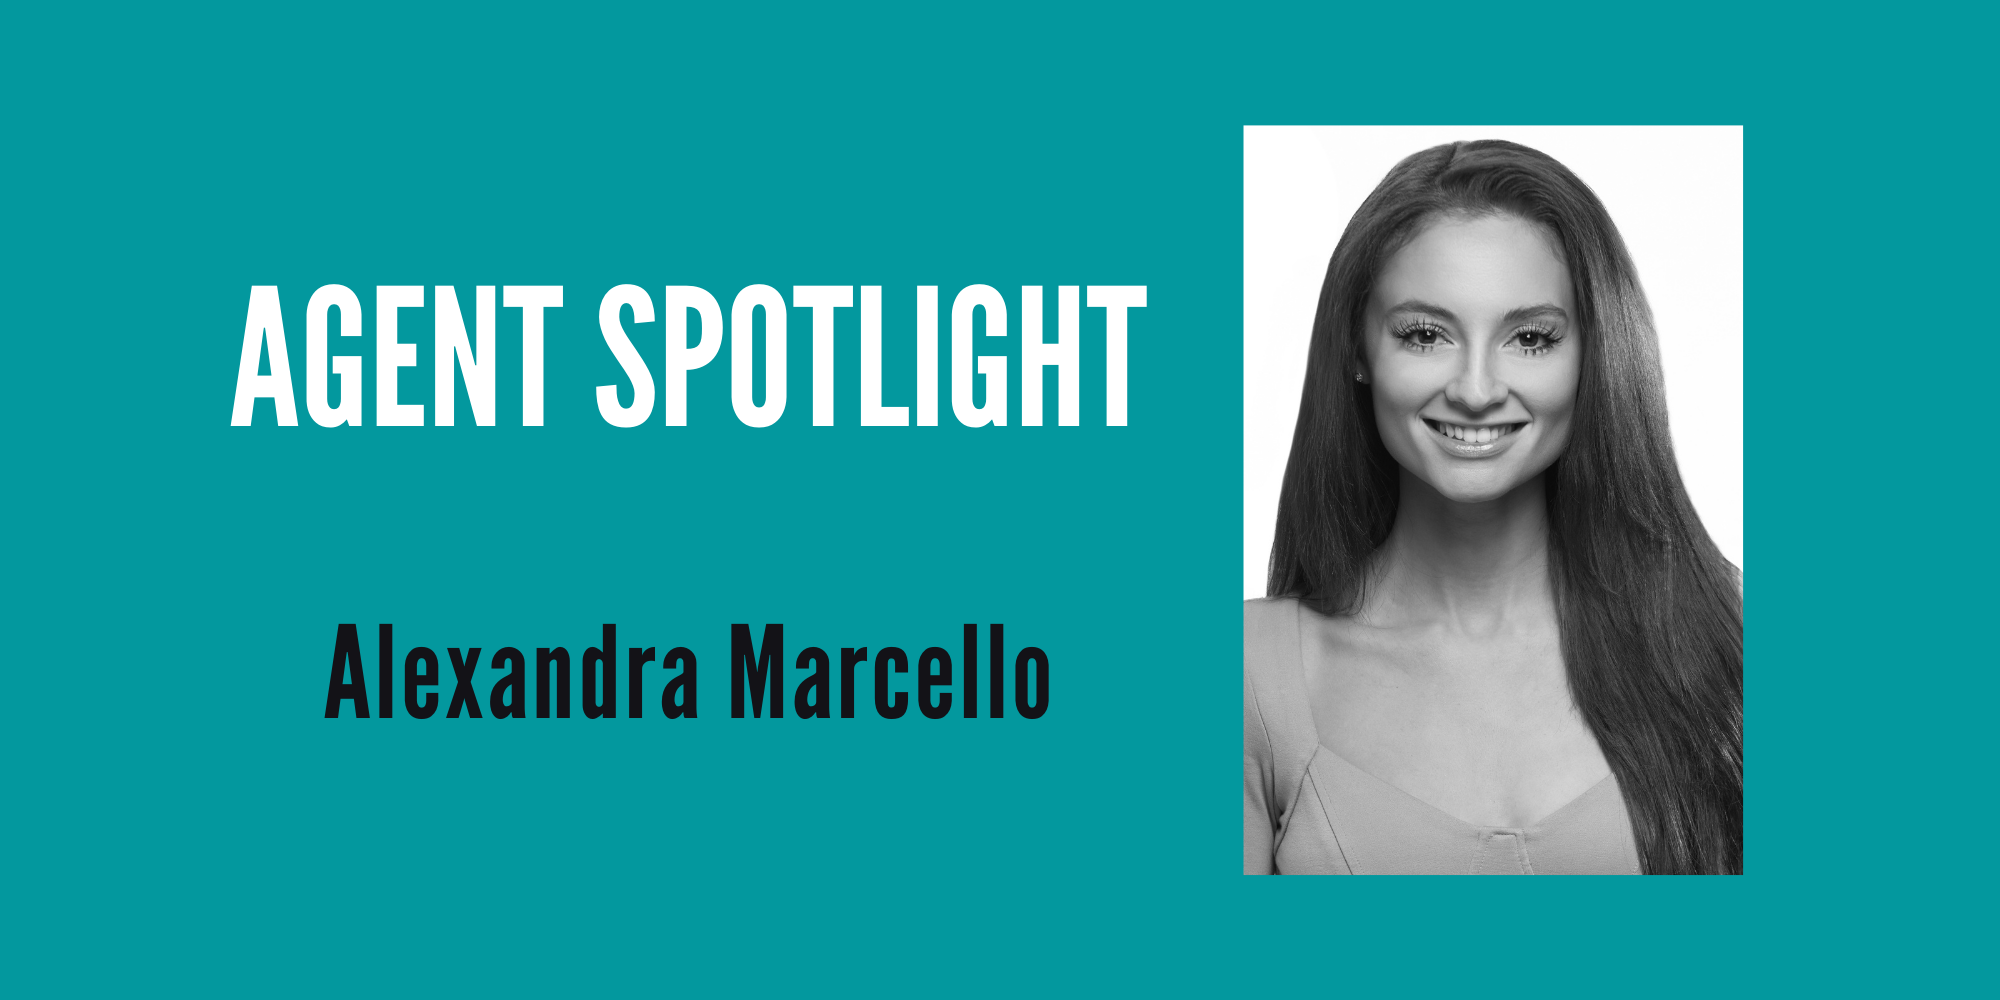 Agent Spotlight: Alexandra Marcello Celebrates One Year at CHARLESGATE